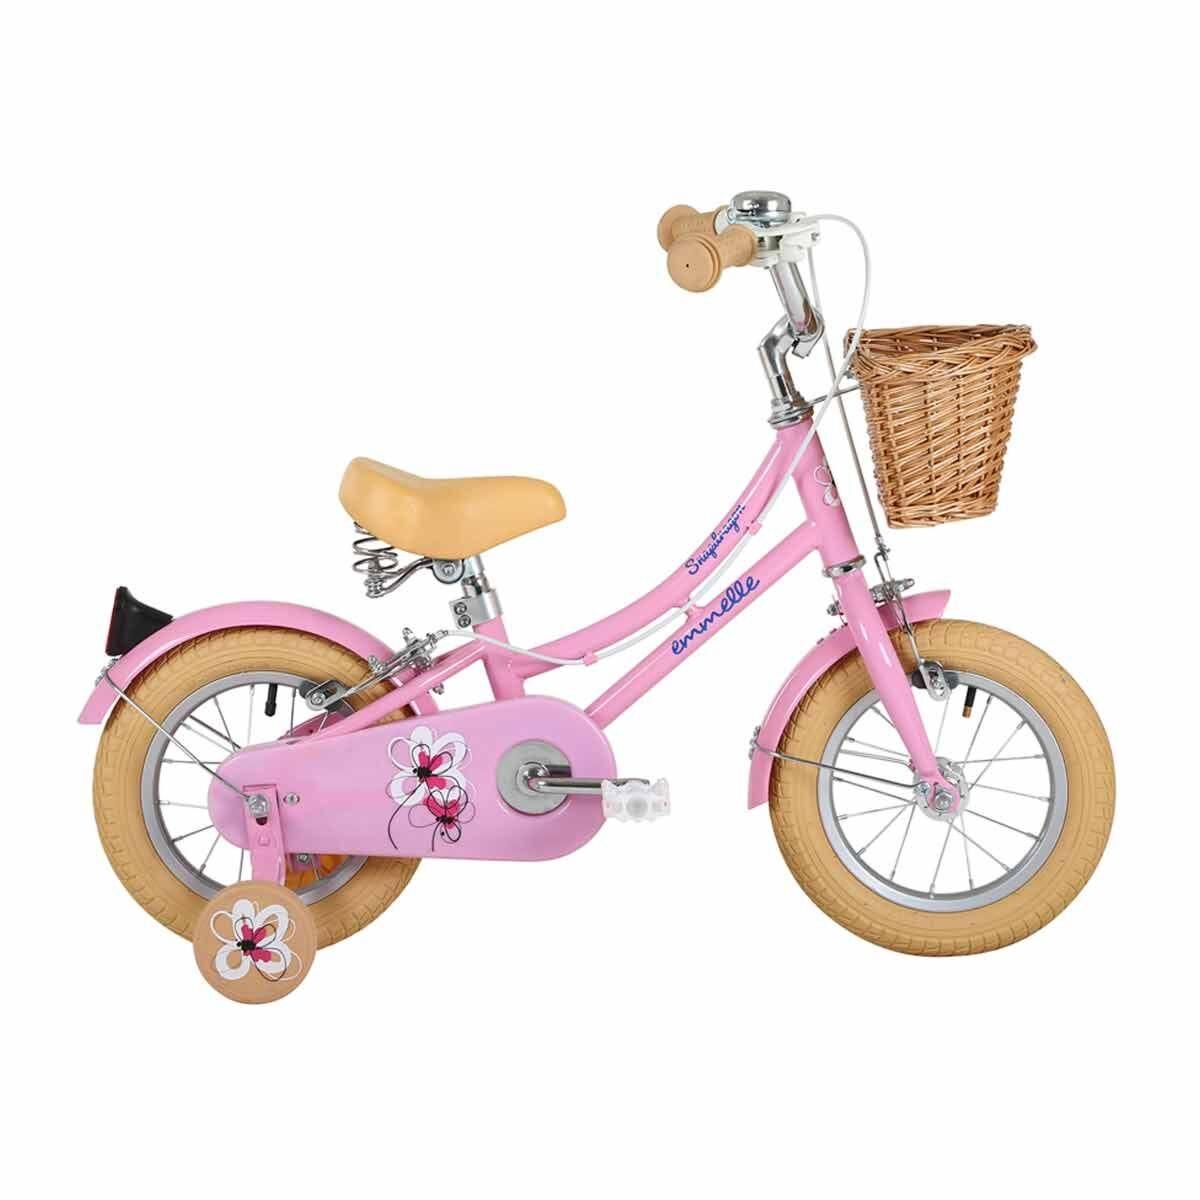 Emmelle Snapdragon Girls Bike 12 Inch Wheel